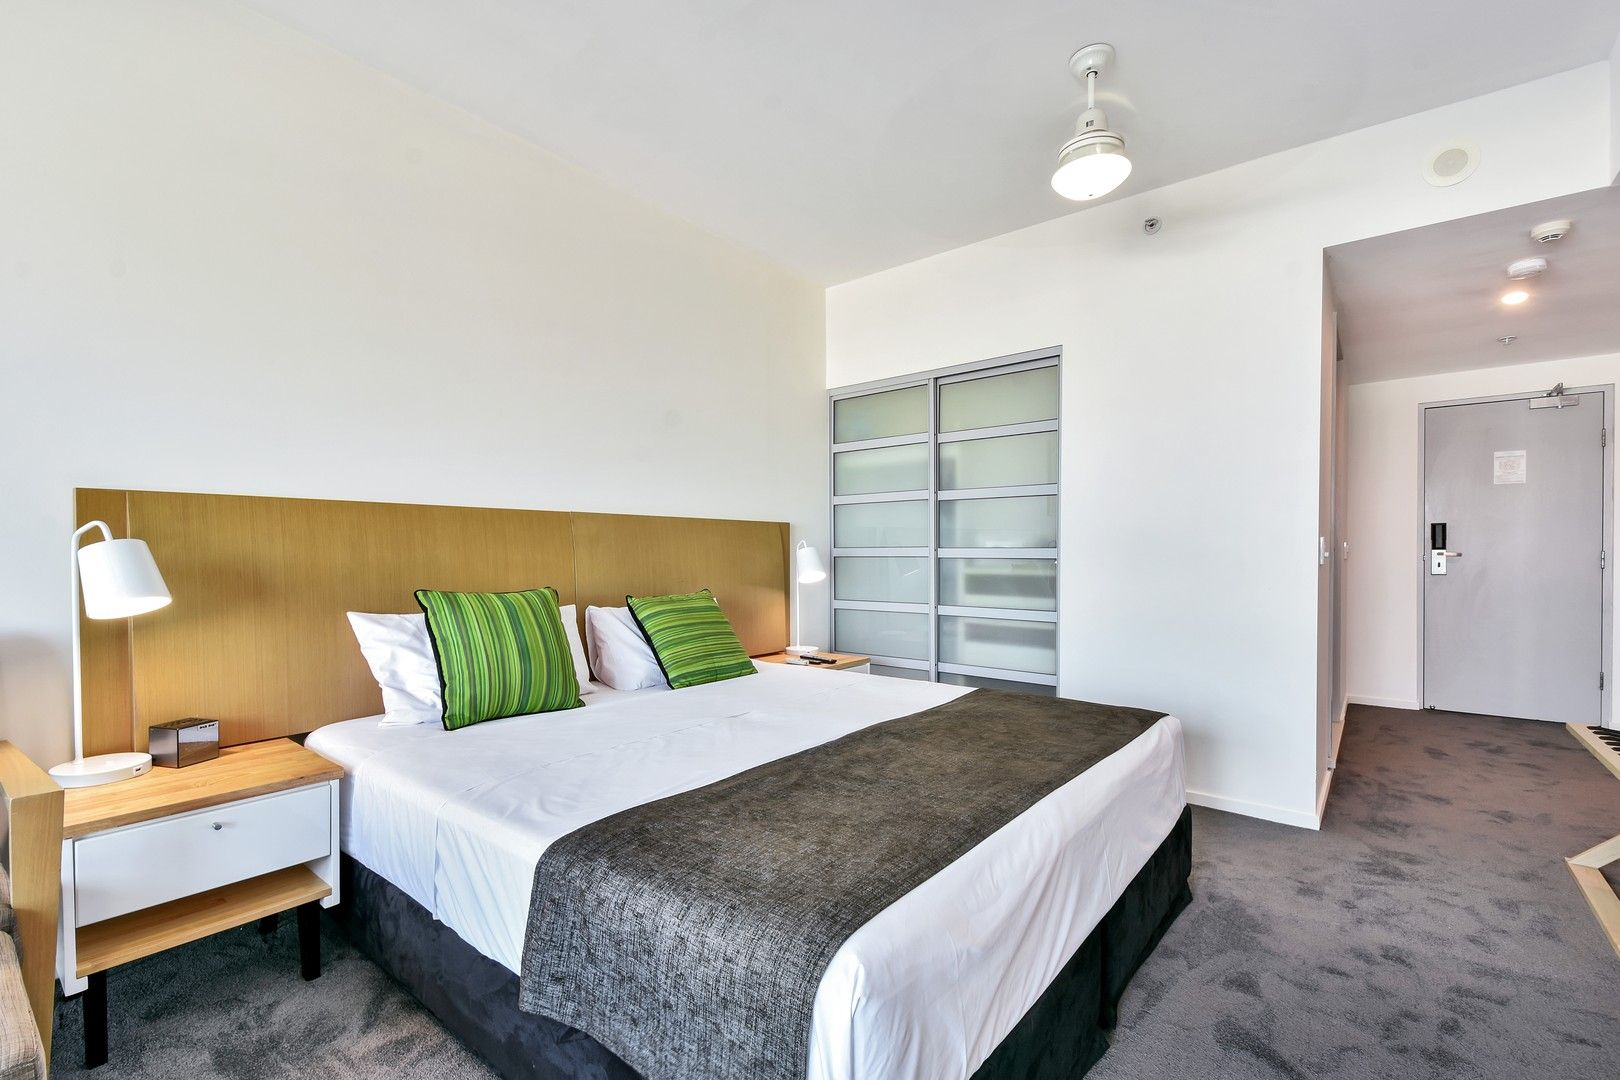 1 bedrooms Apartment / Unit / Flat in 1517/43 Knuckey Street DARWIN CITY NT, 0800